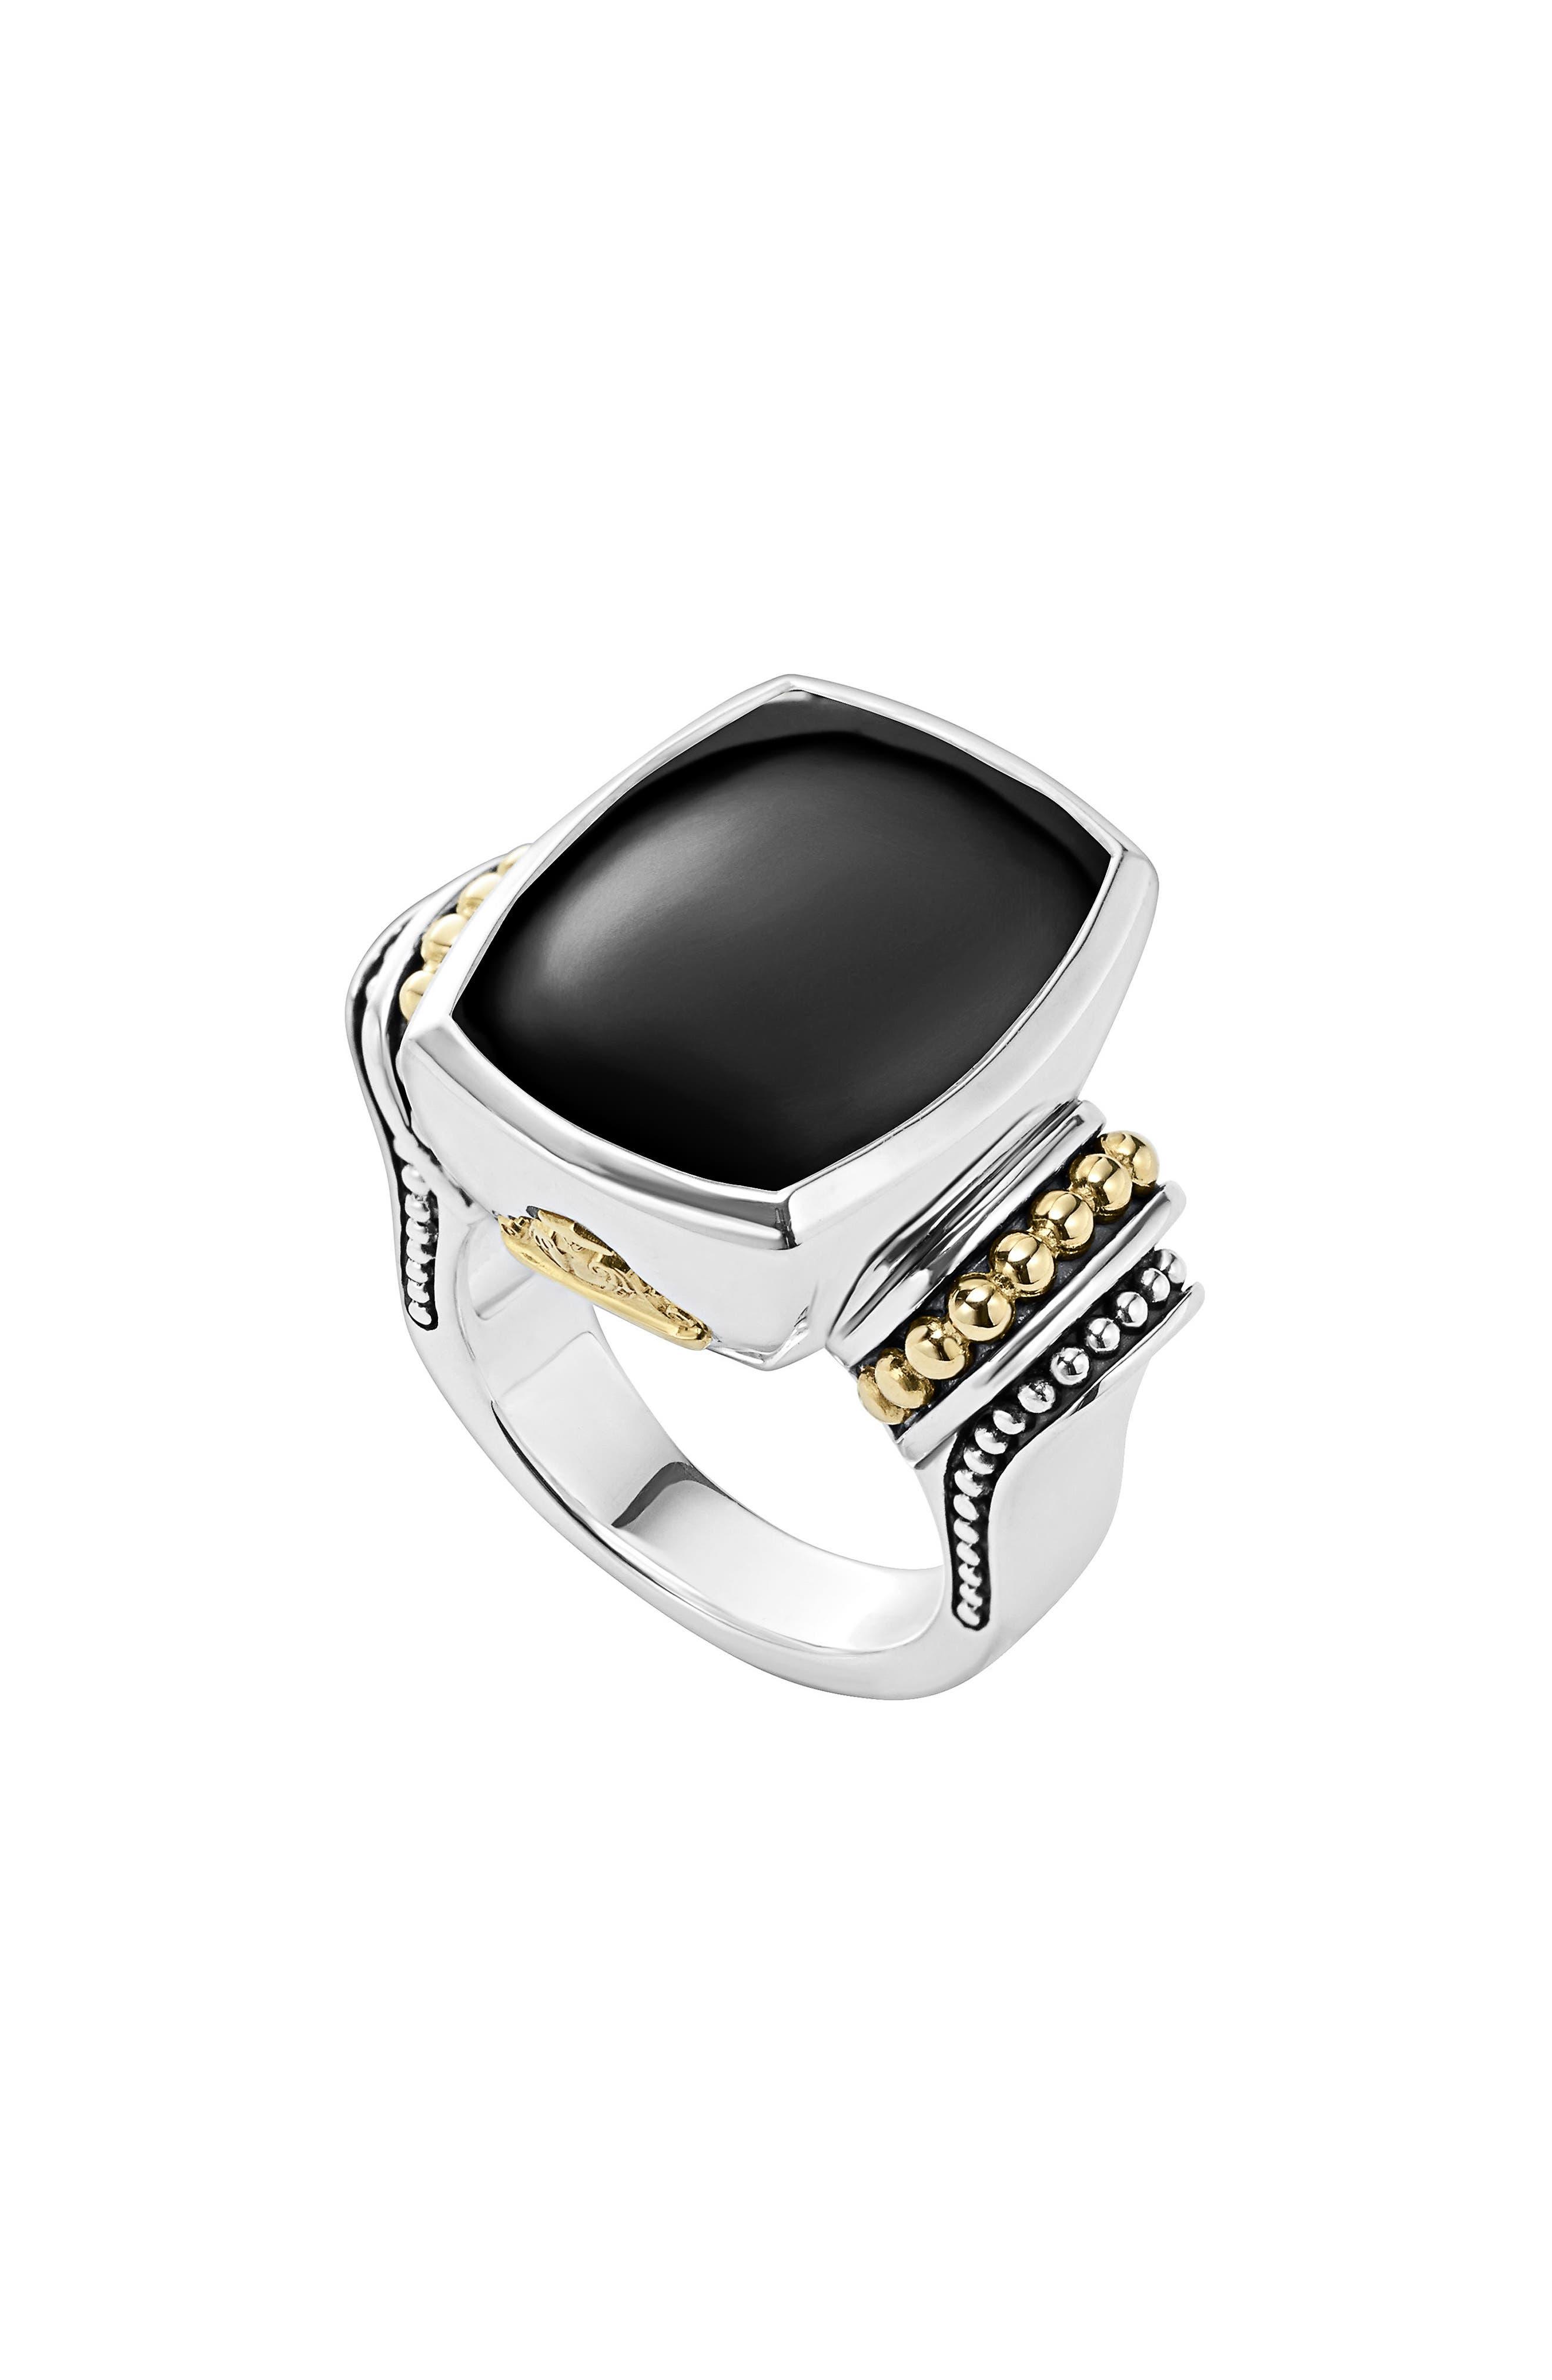 Main Image - LAGOS 'Caviar Color' Large Semiprecious Stone Ring